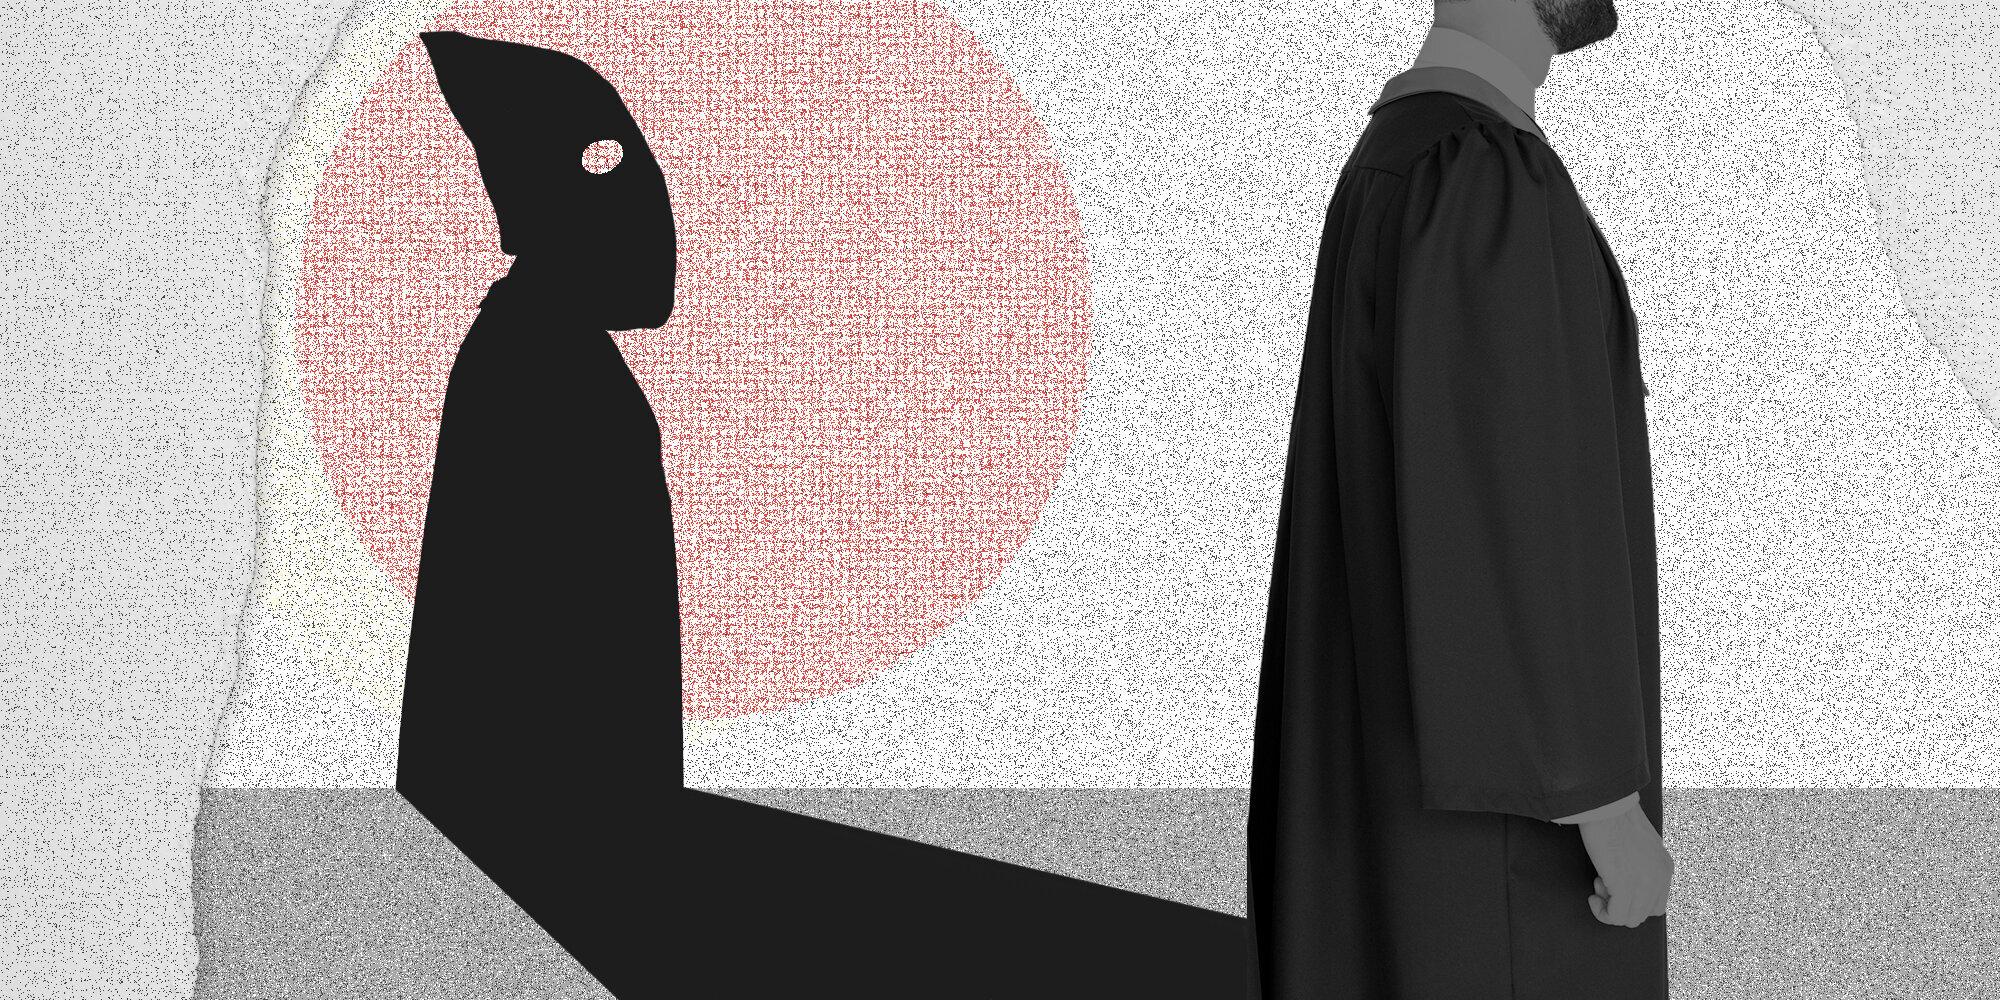 The White Supremacist Professor Teaching At A Public University